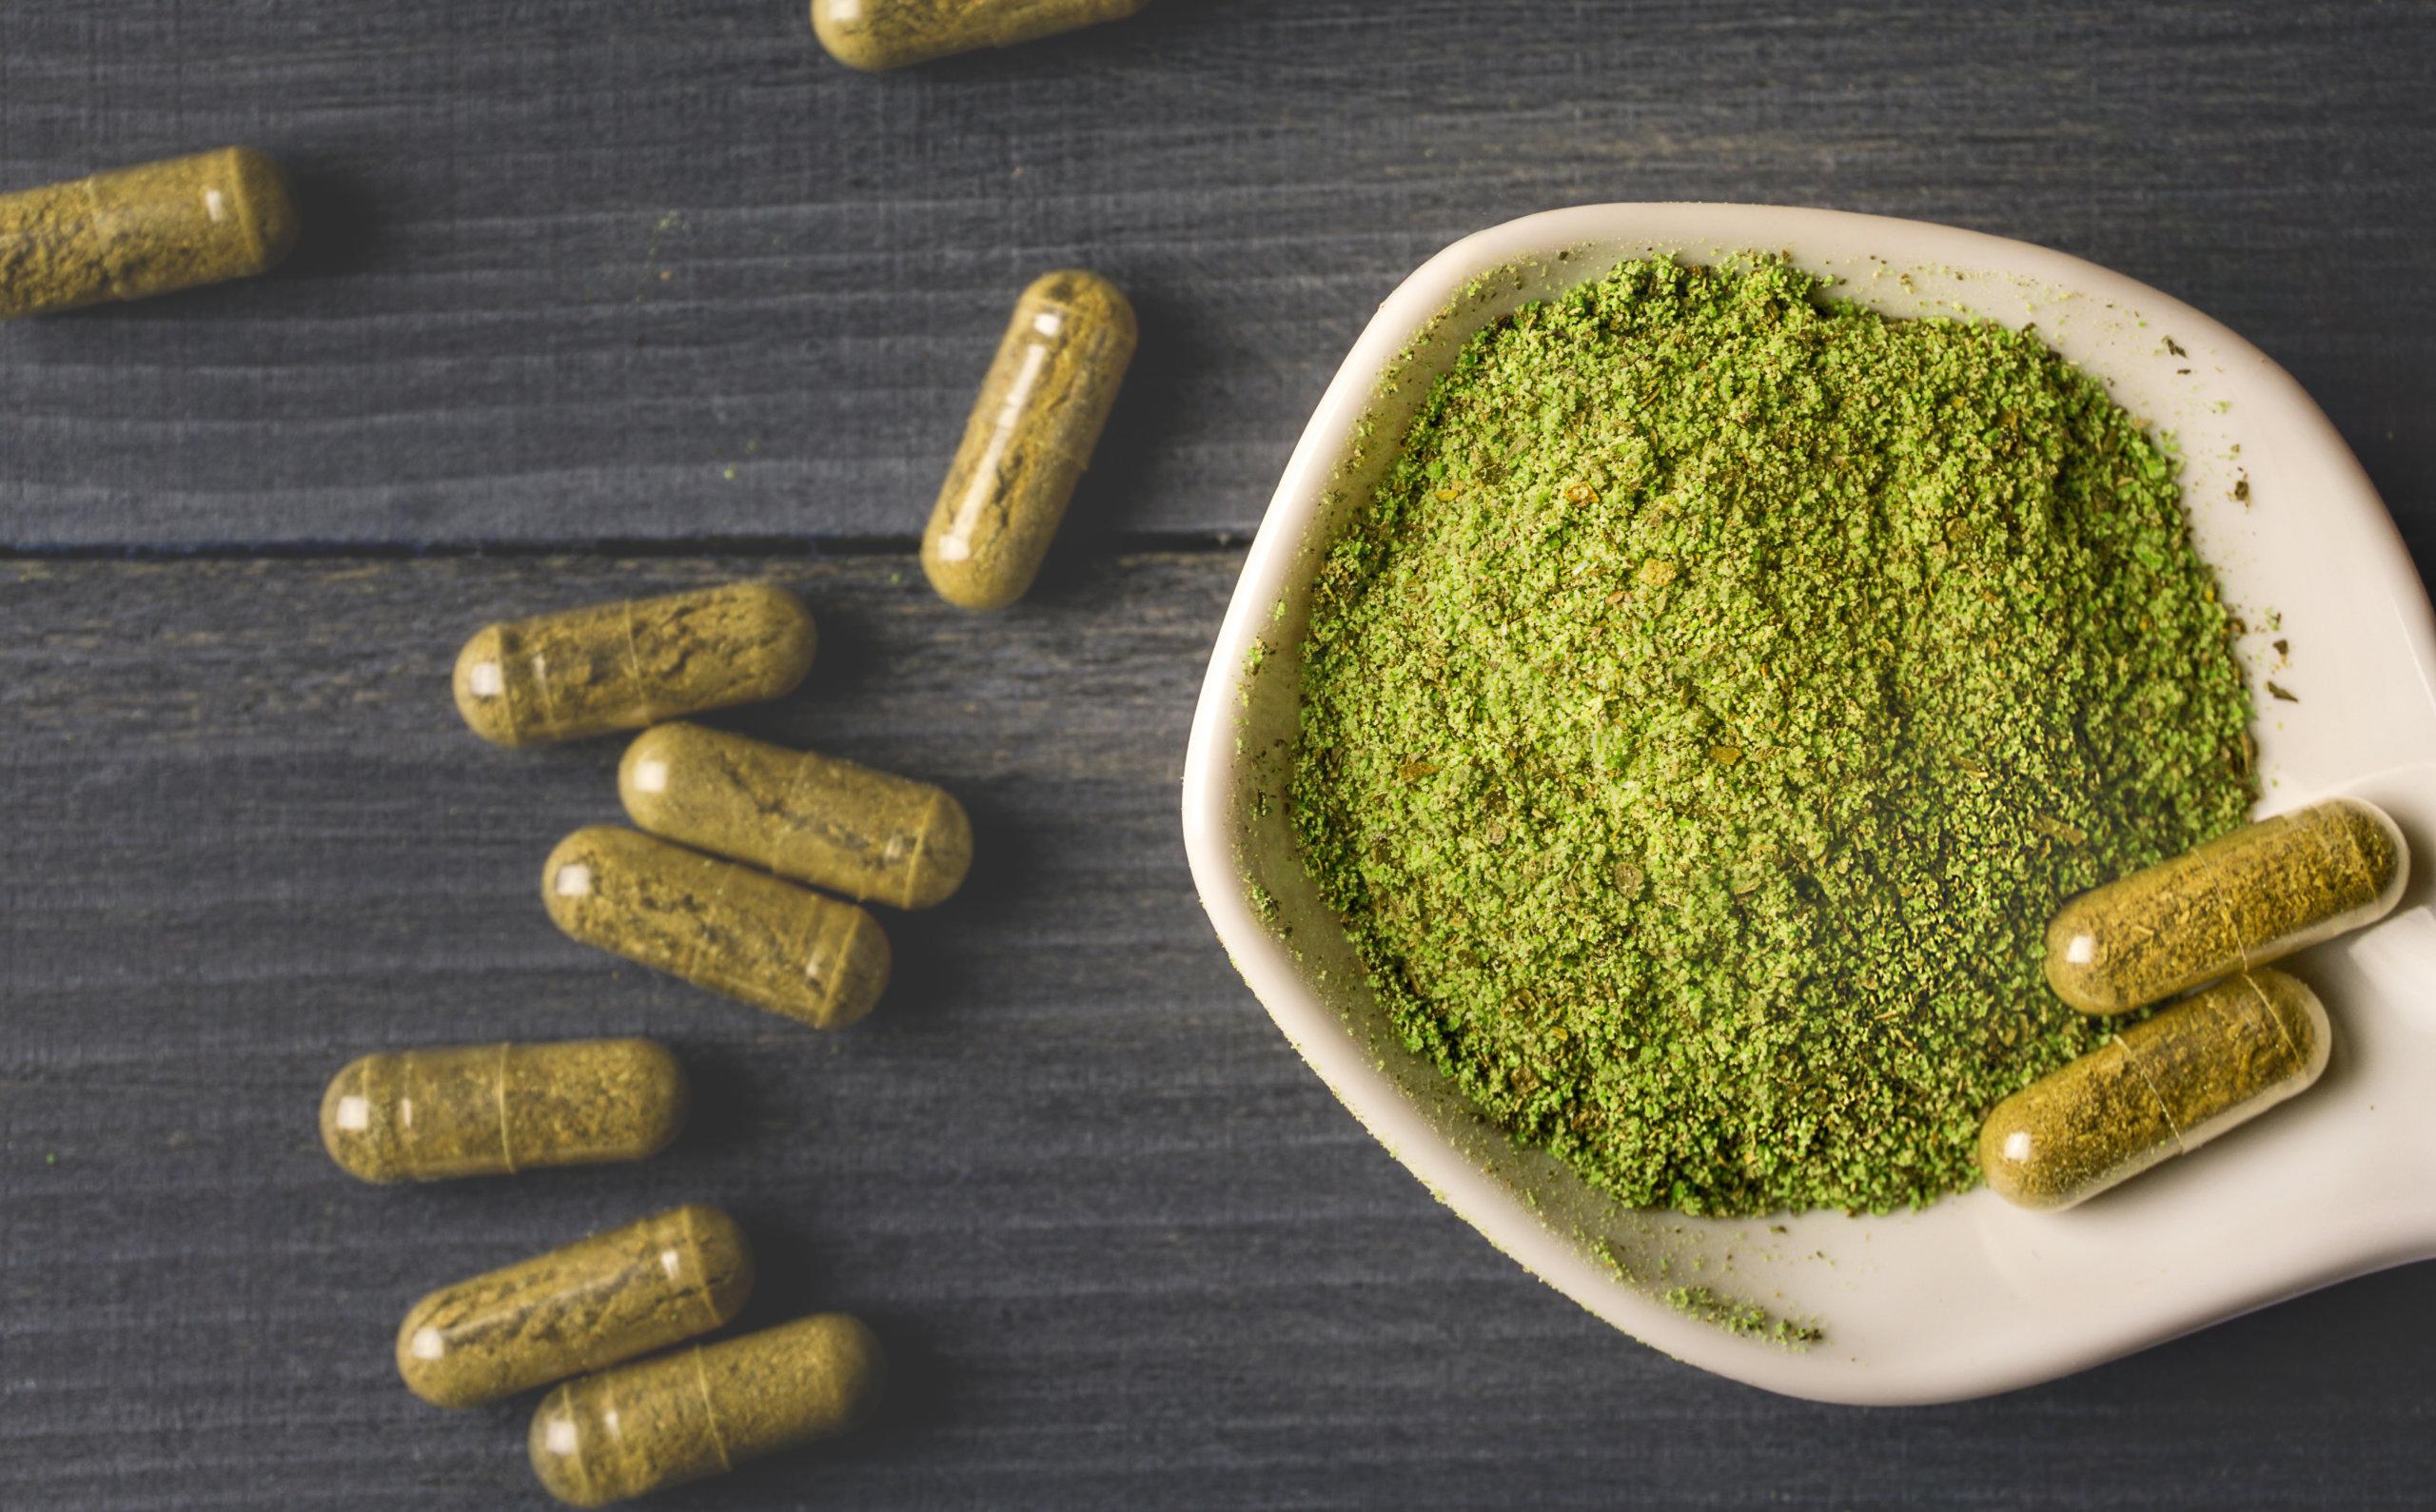 Red Veined Bali Supreme Powder for Sale - Kratom-K